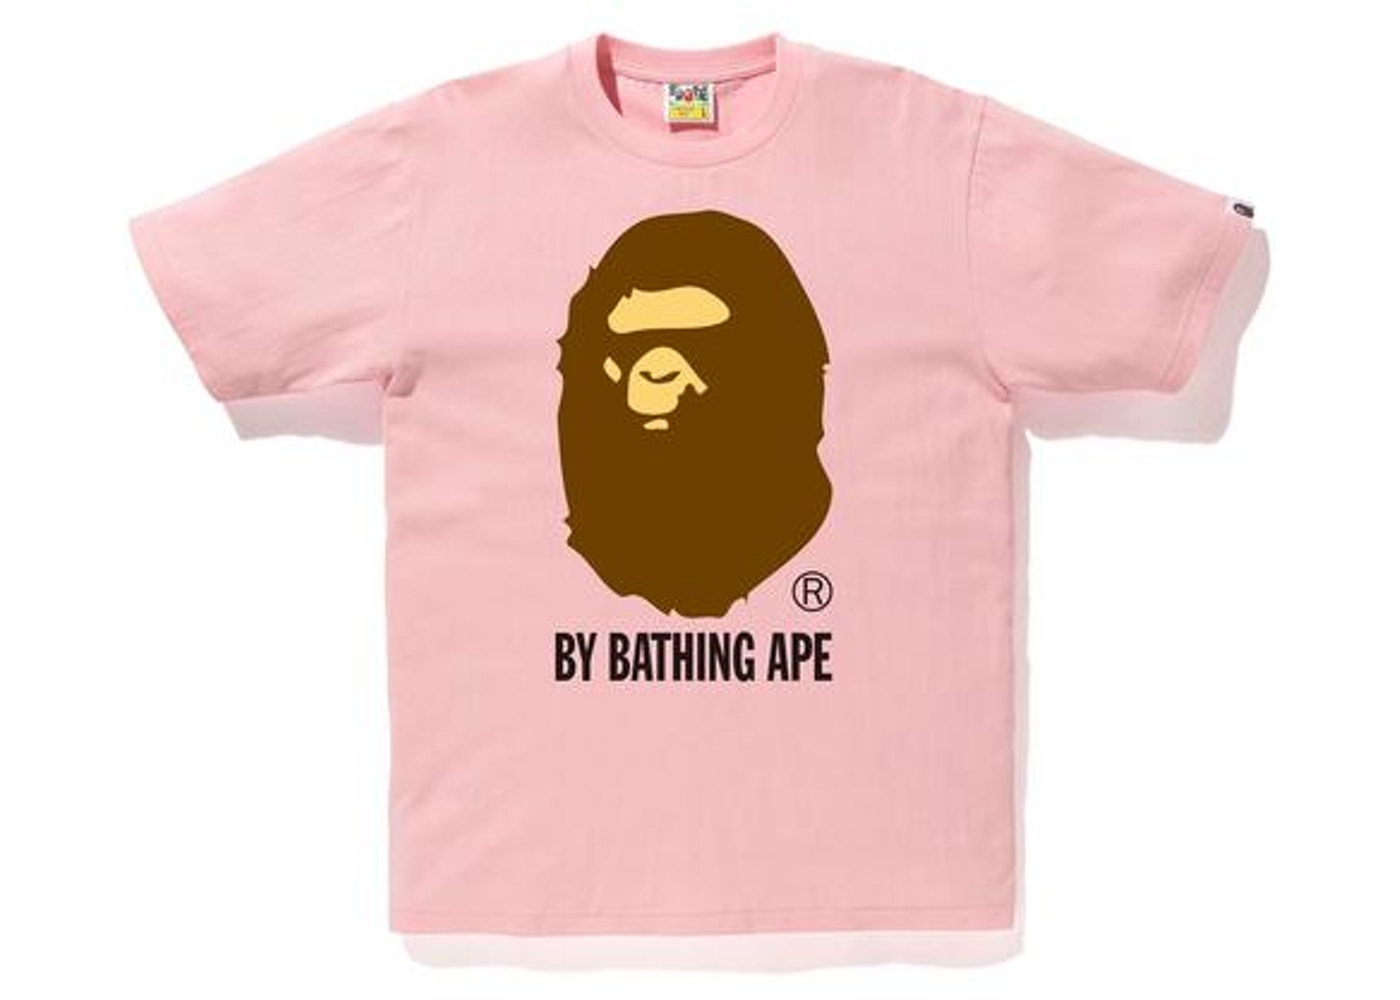 BAPE By Bathing Ape Tee (SS20) Pink - SS20